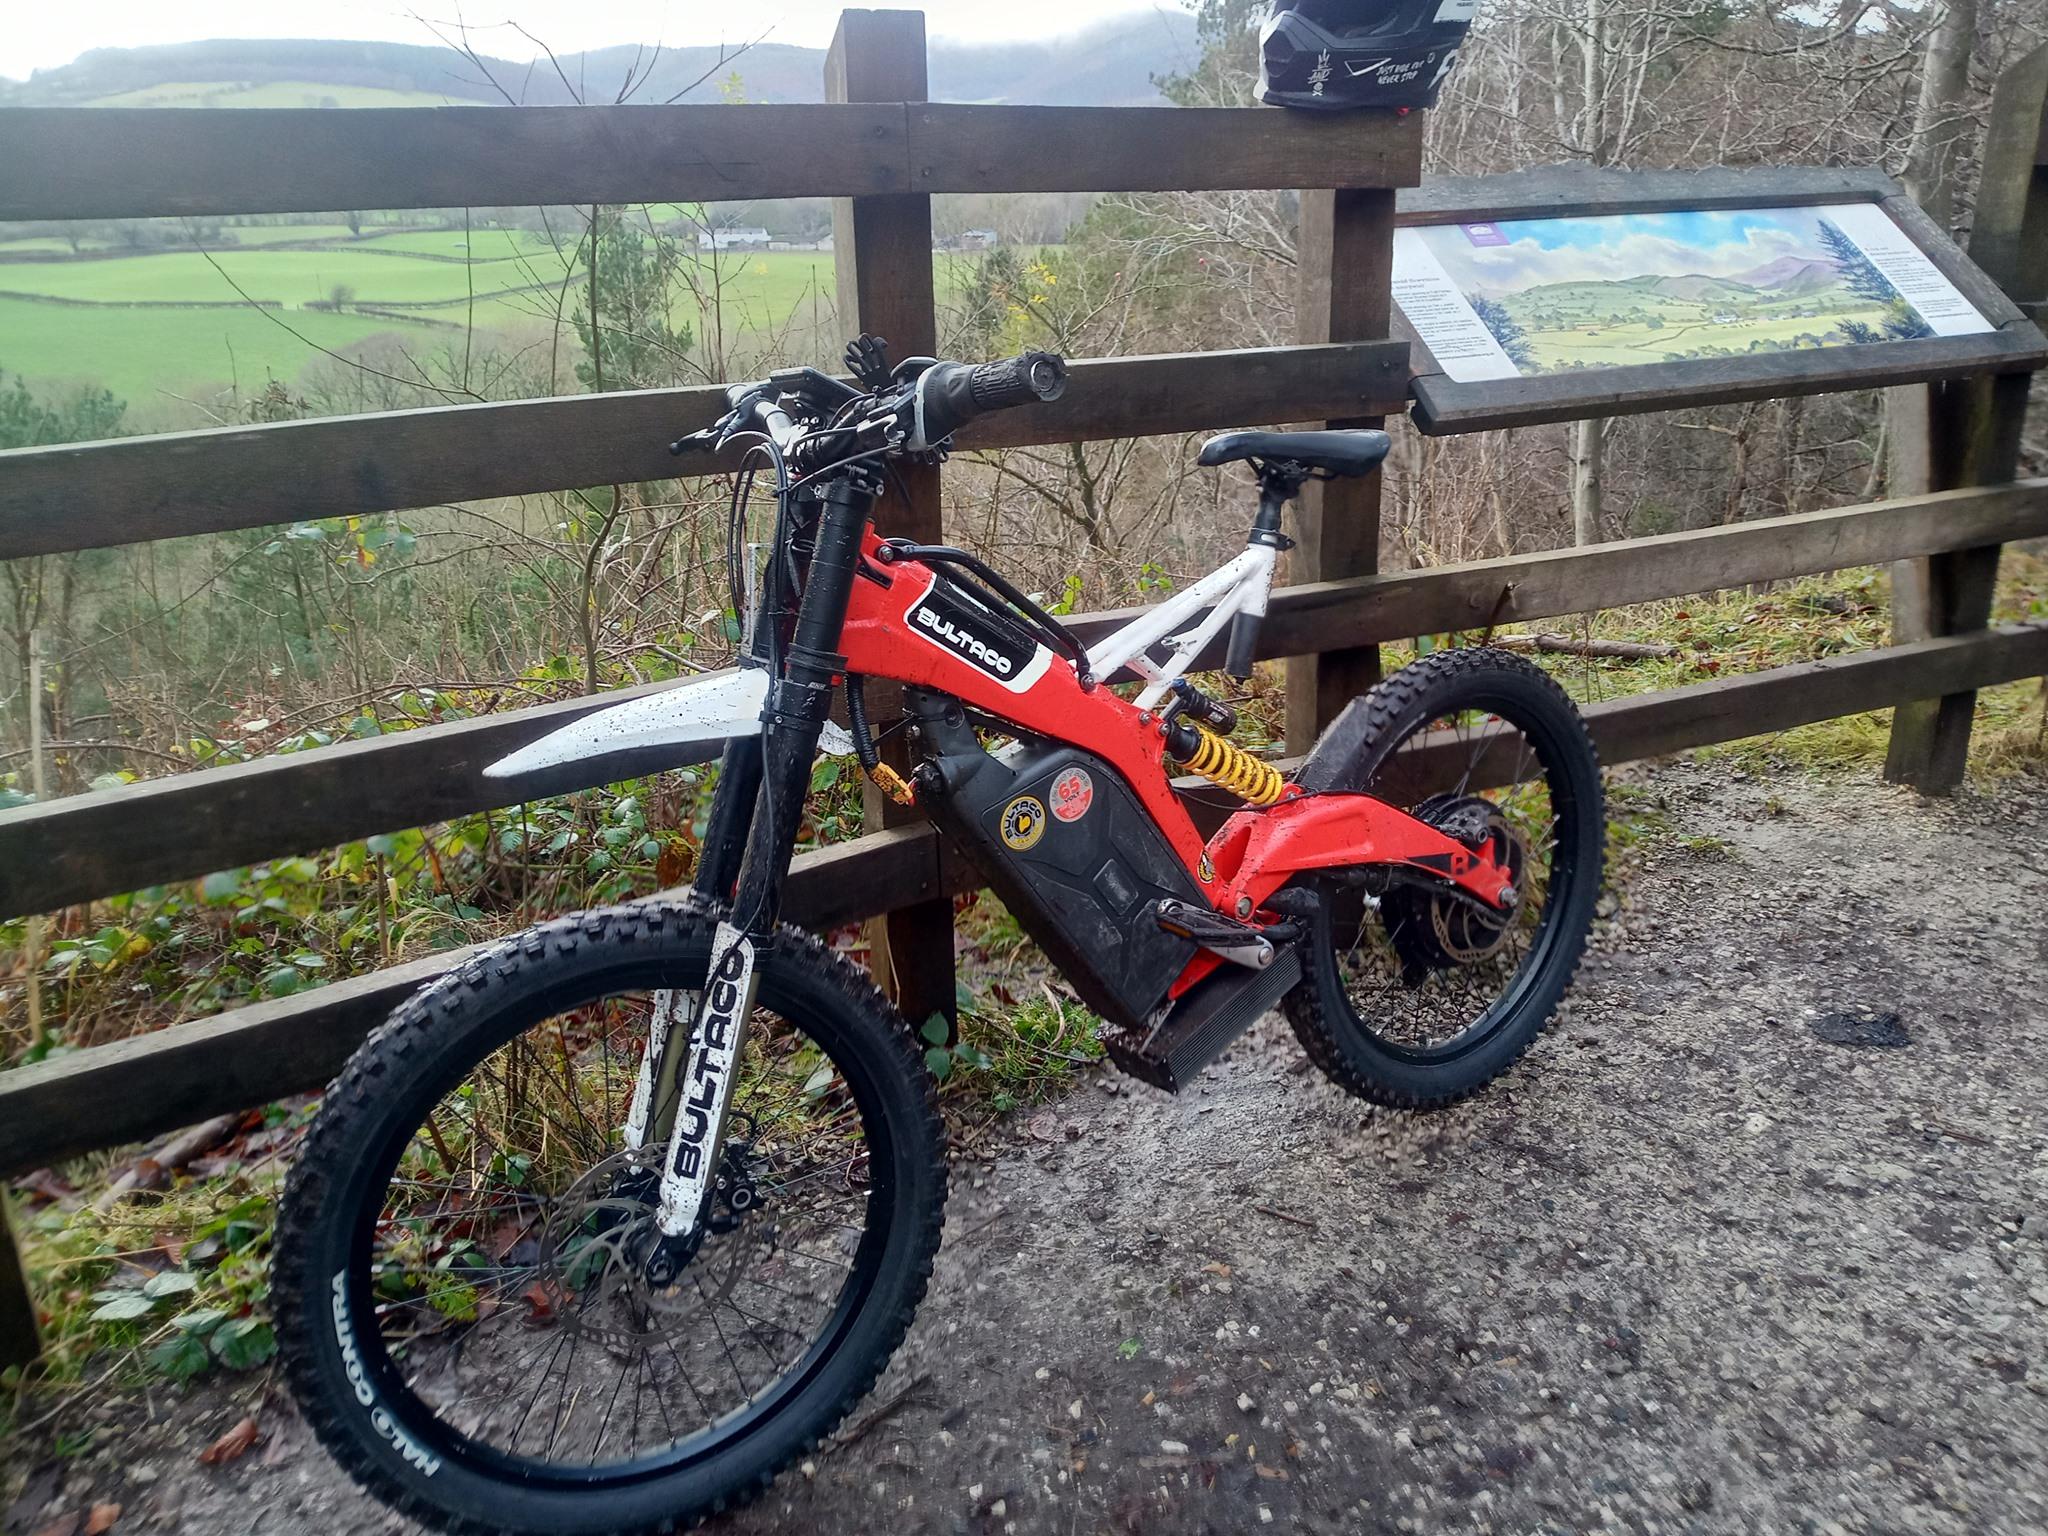 Wyde Rides Custom Bultaco Brinco E-Bike Services UK